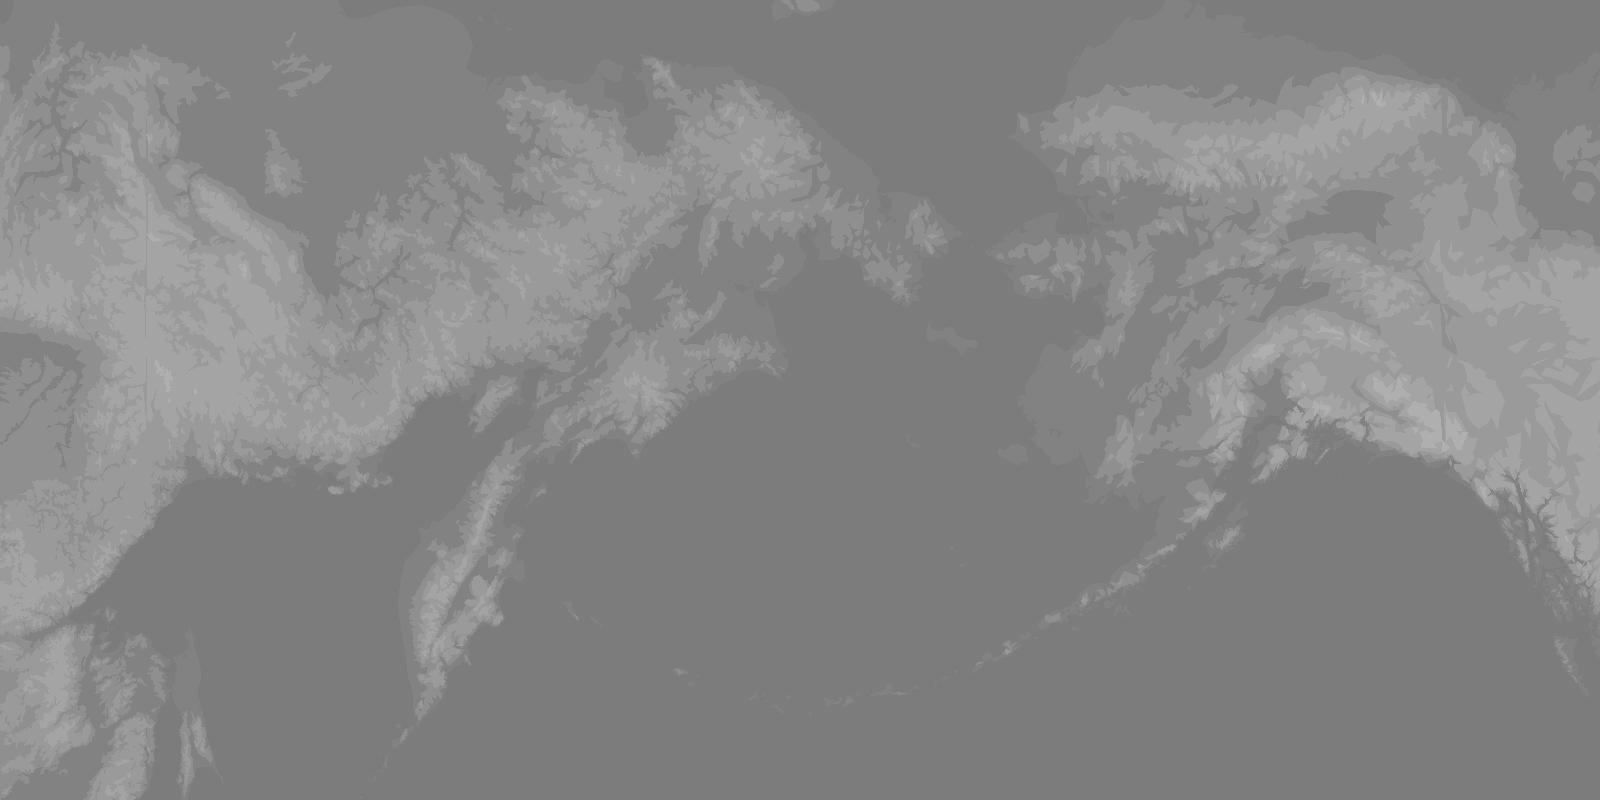 Bering_1600_800(mono).png